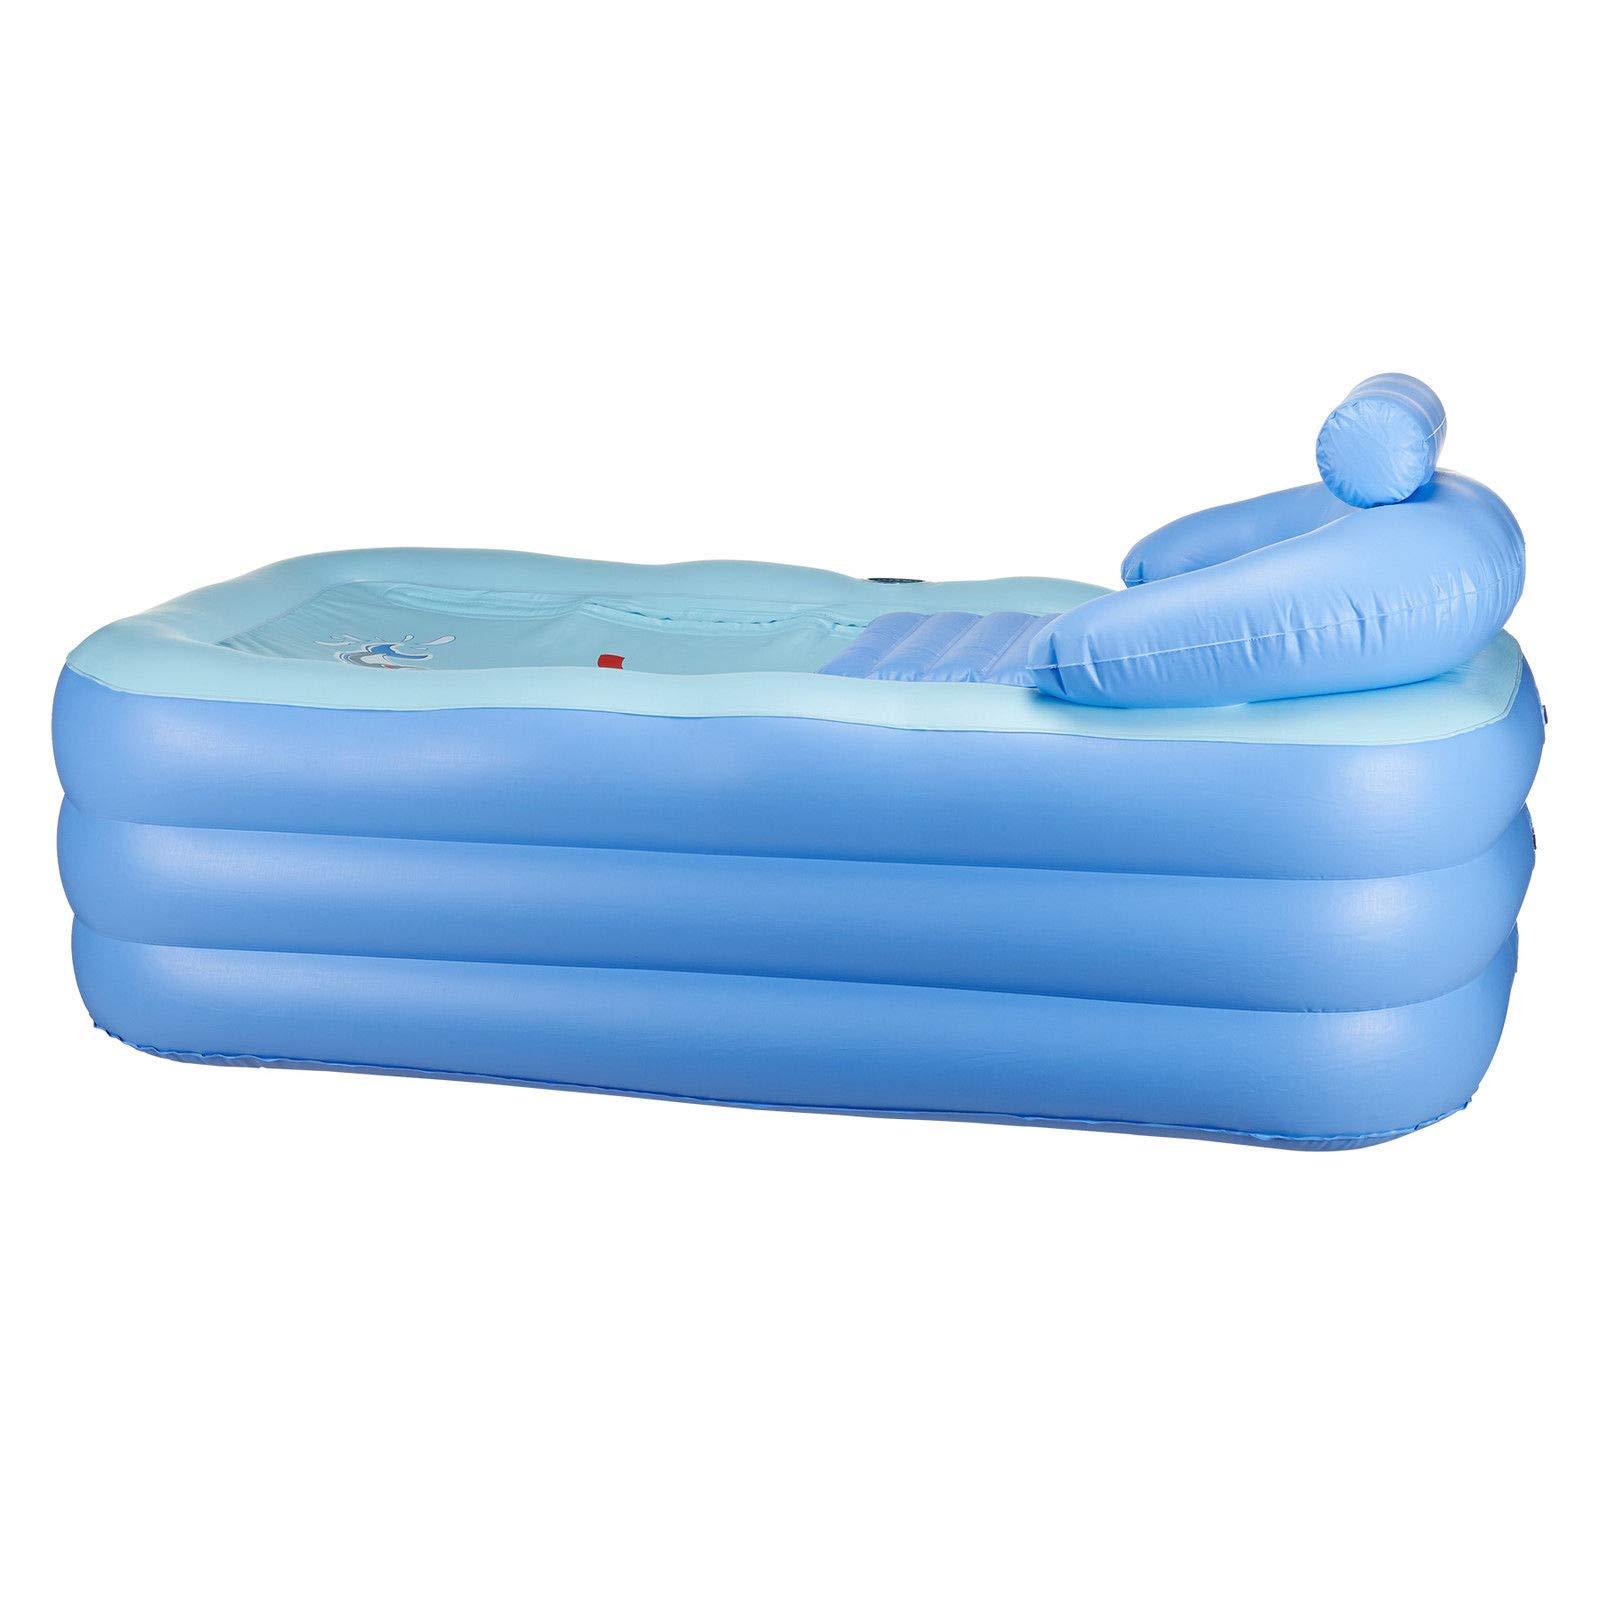 LZHQT Blow Up Adult PVC Folding Portable Foldable Bathtub Inflatable Bath Tub Air Pump by LZHQT (Image #4)